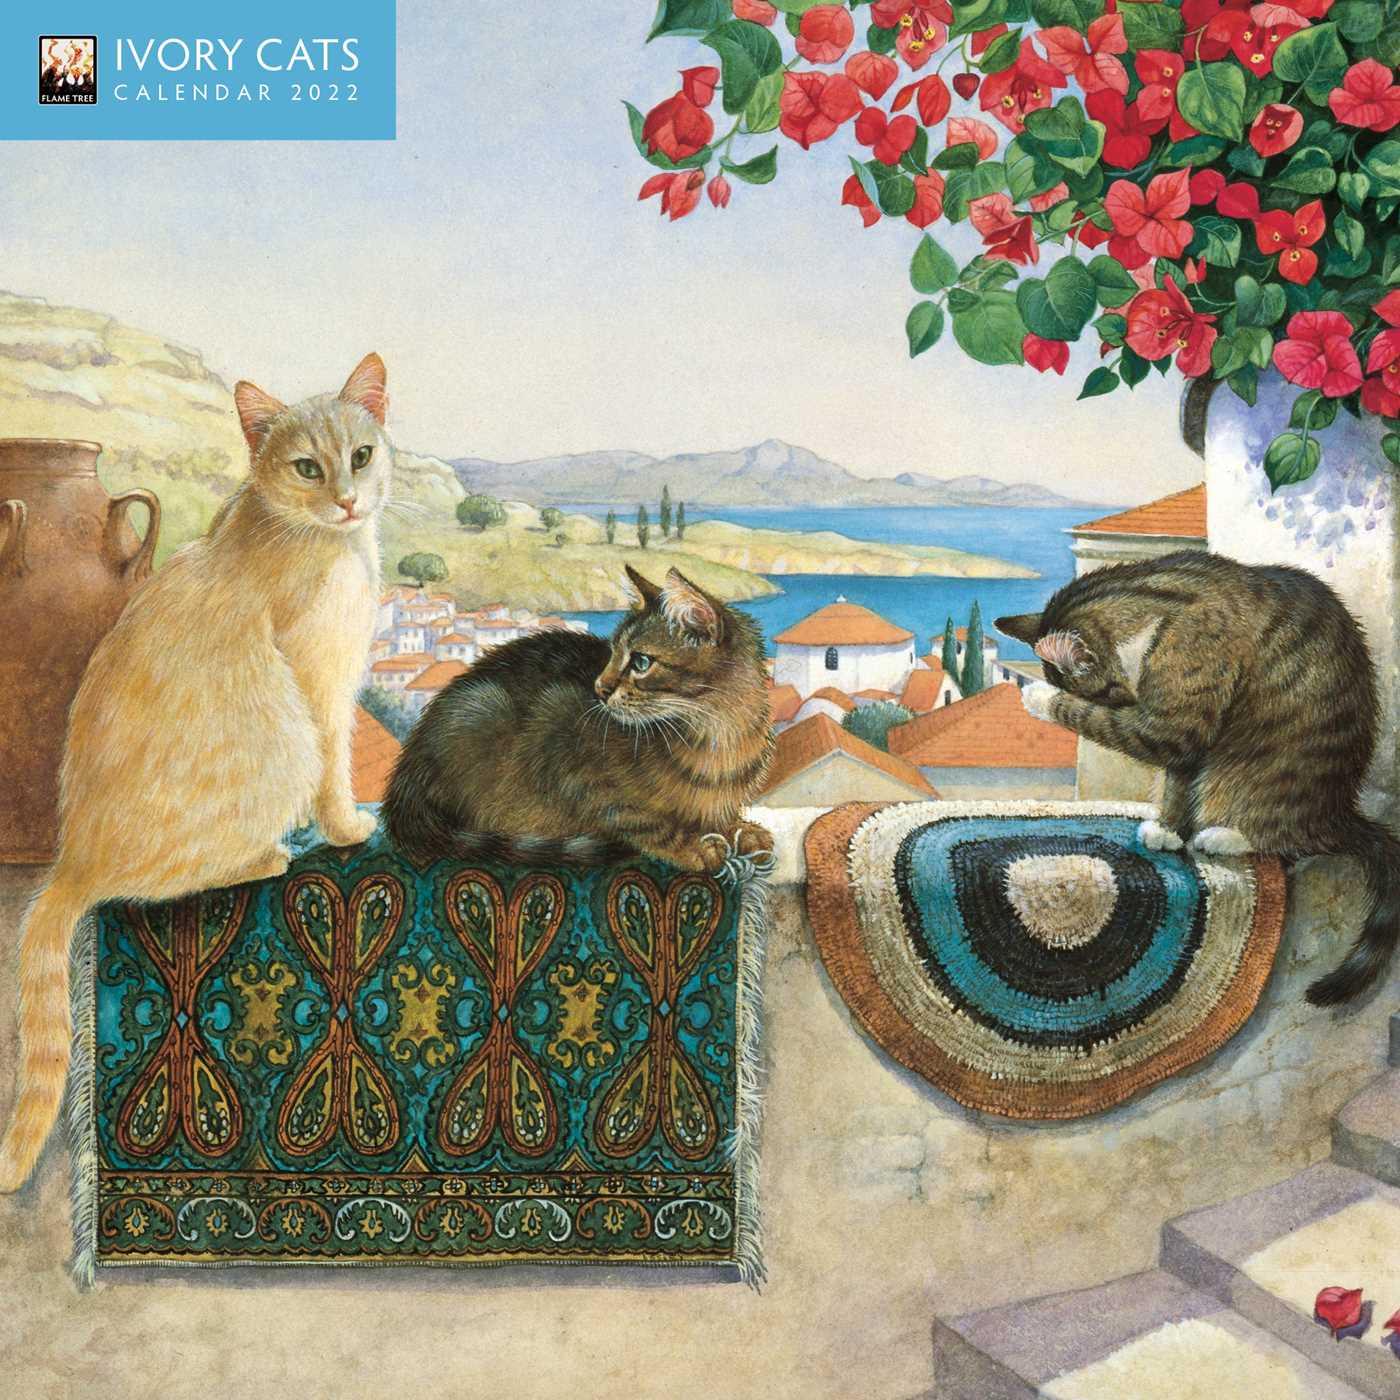 Cat Calendar 2022.Ivory Cats Mini Wall Calendar 2022 Art Calendar Book Summary Video Official Publisher Page Simon Schuster